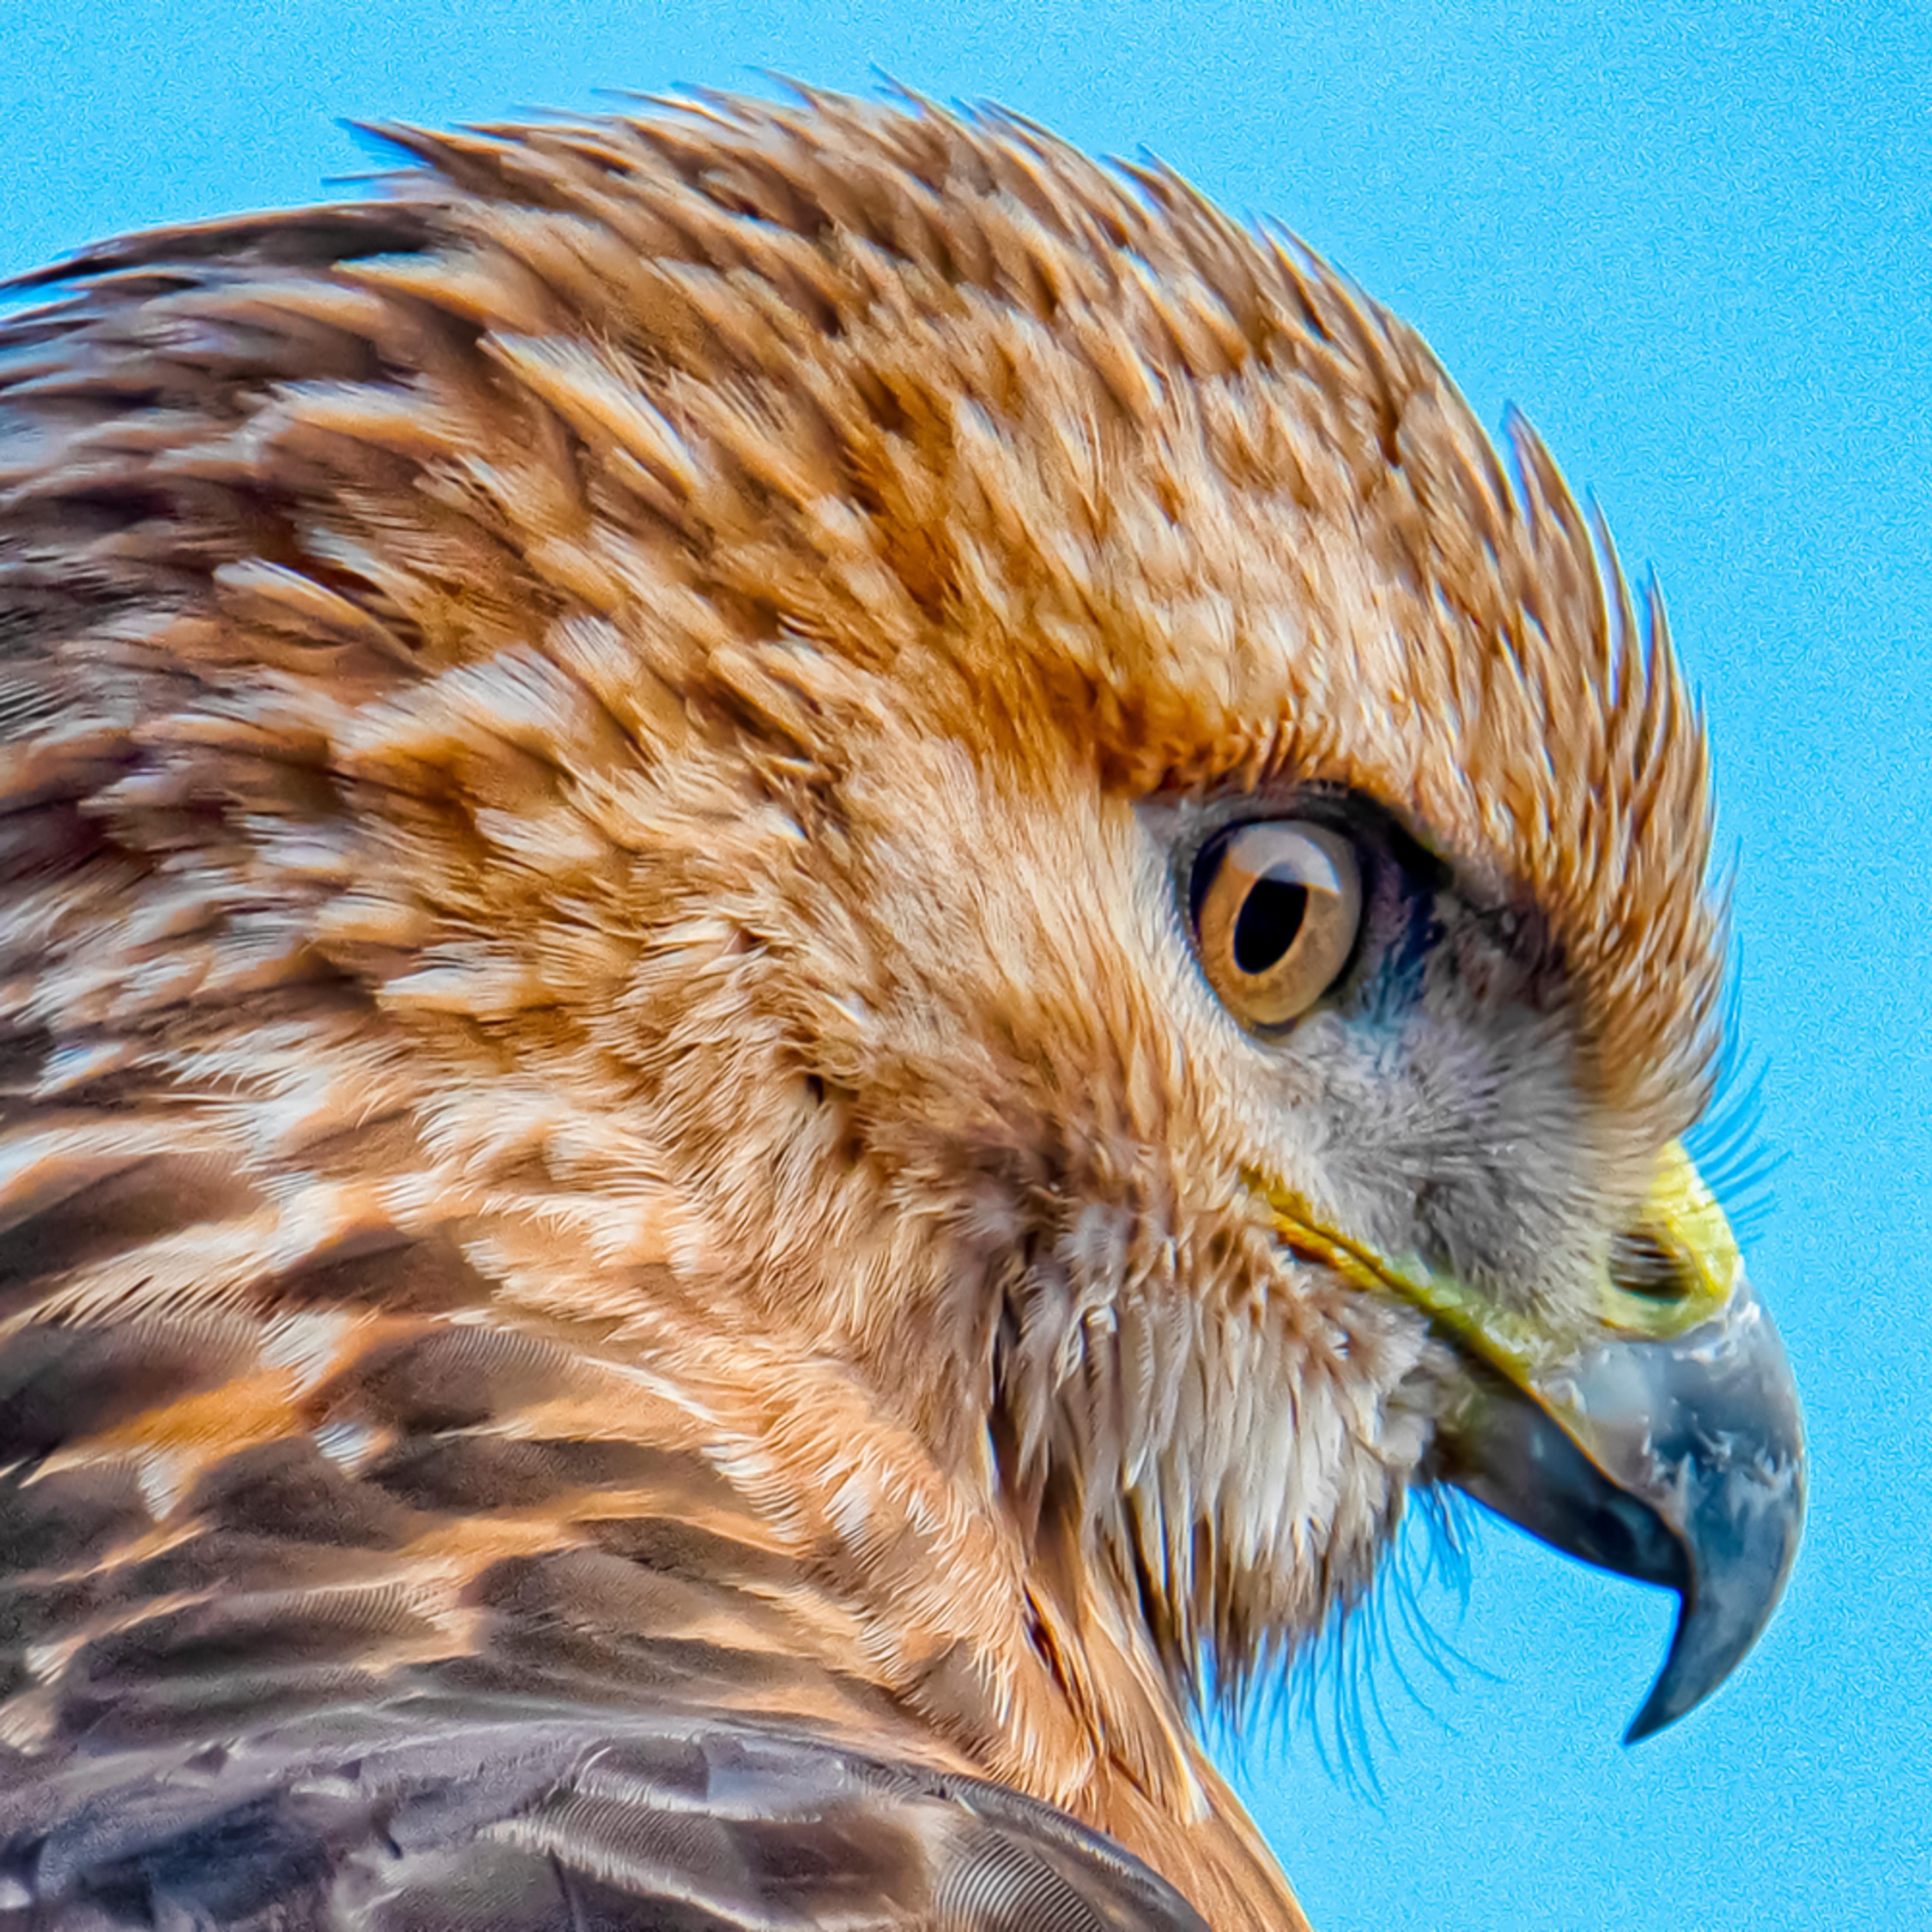 Red tail hawk closeup qgvrk9